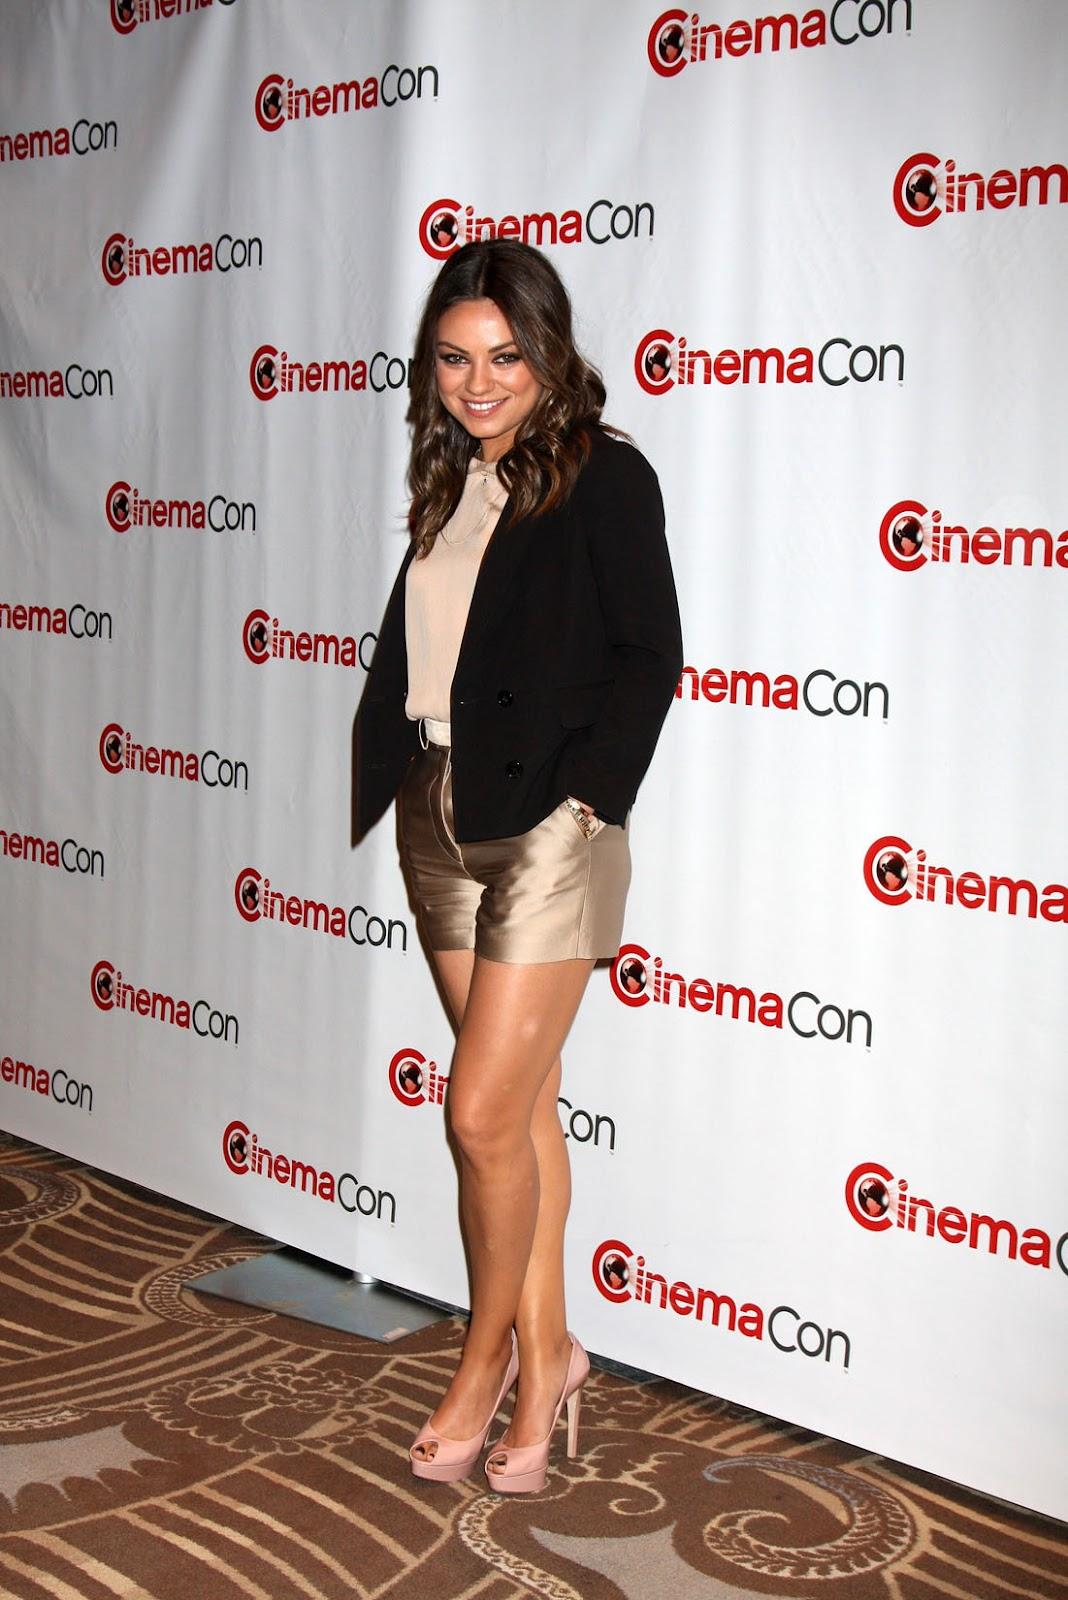 http://3.bp.blogspot.com/-r7FVCw5ycoA/T5m2zSERu3I/AAAAAAAAHN0/EUdzVkZ62xY/s1600/mila_kunis_shorts_legs_12.jpg